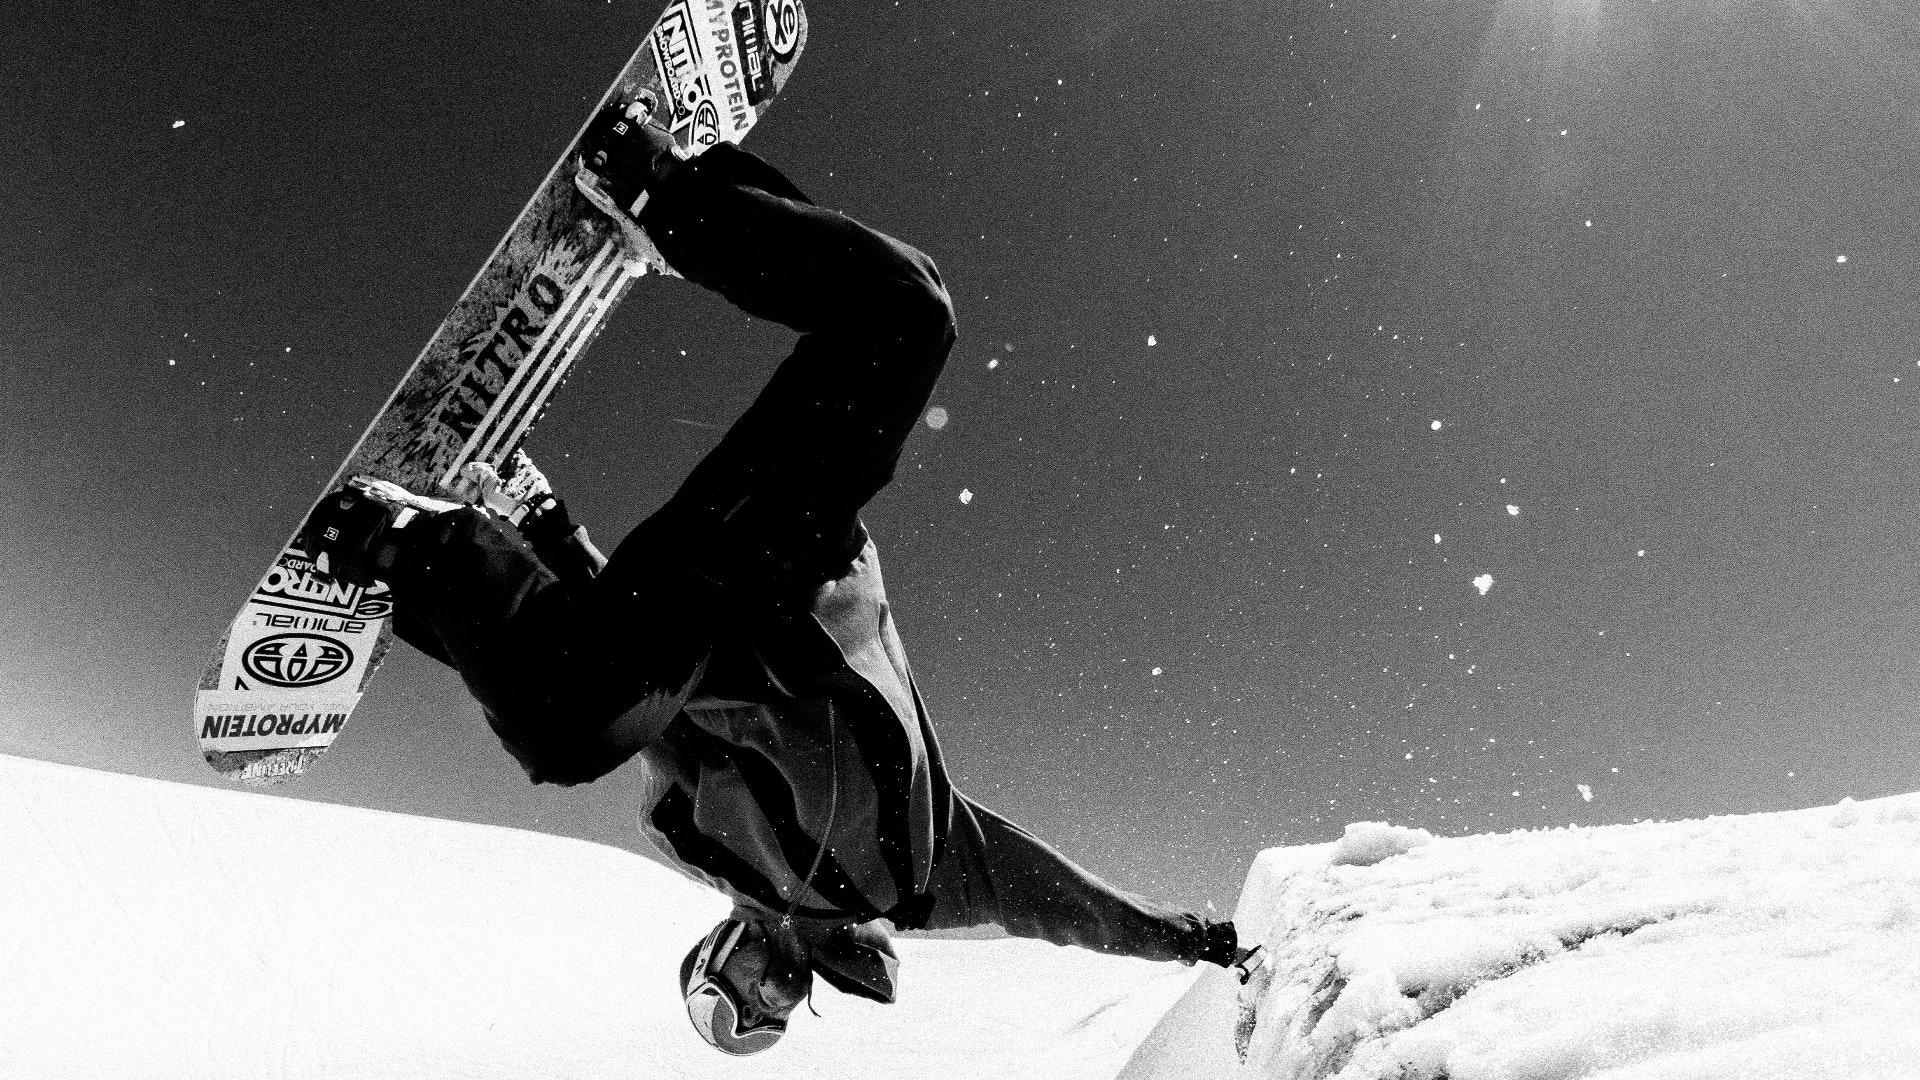 Wallpapers Whitelines Snowboarding